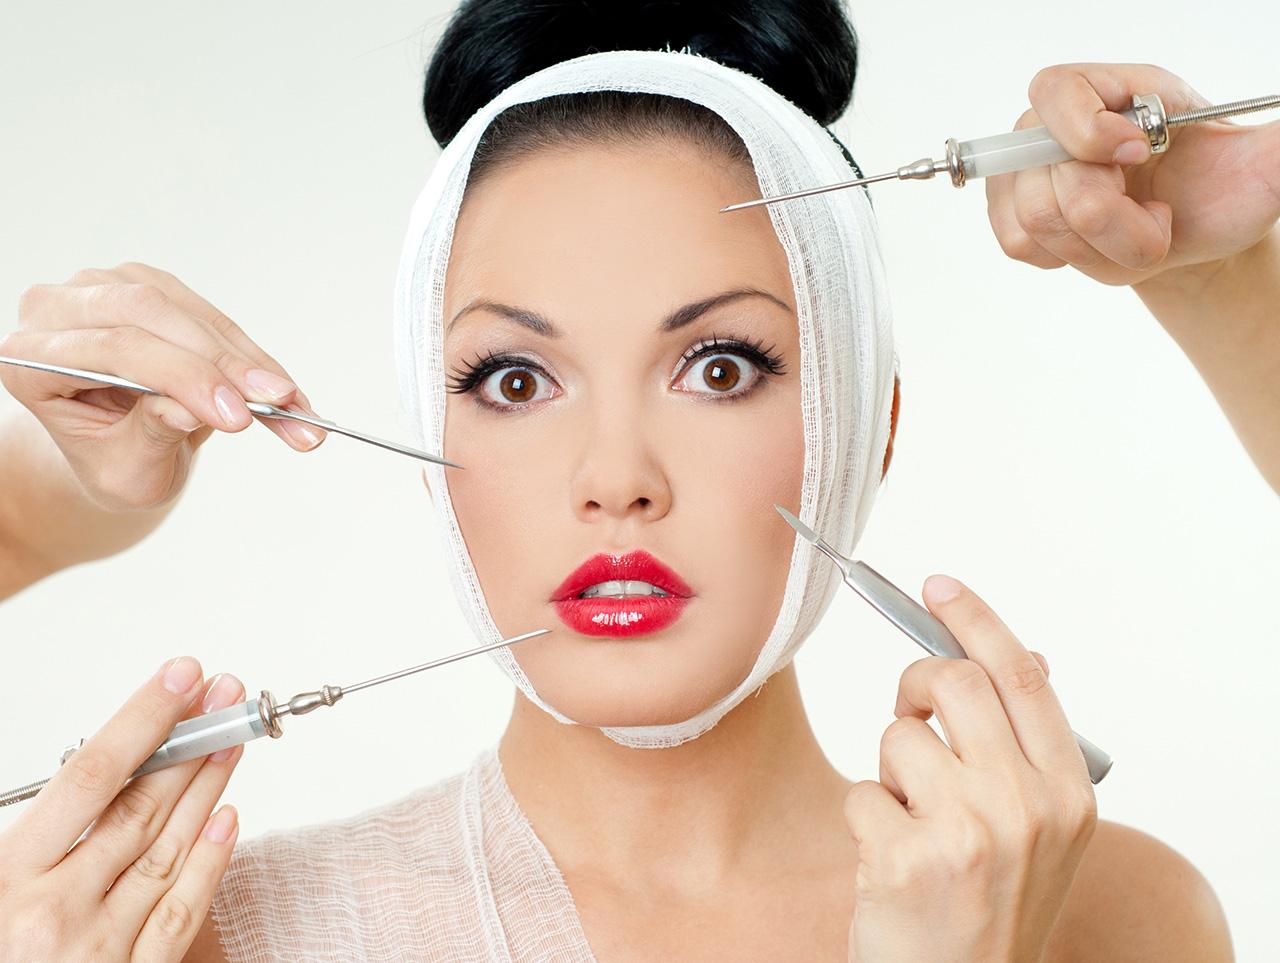 vanity cosmetic surgery